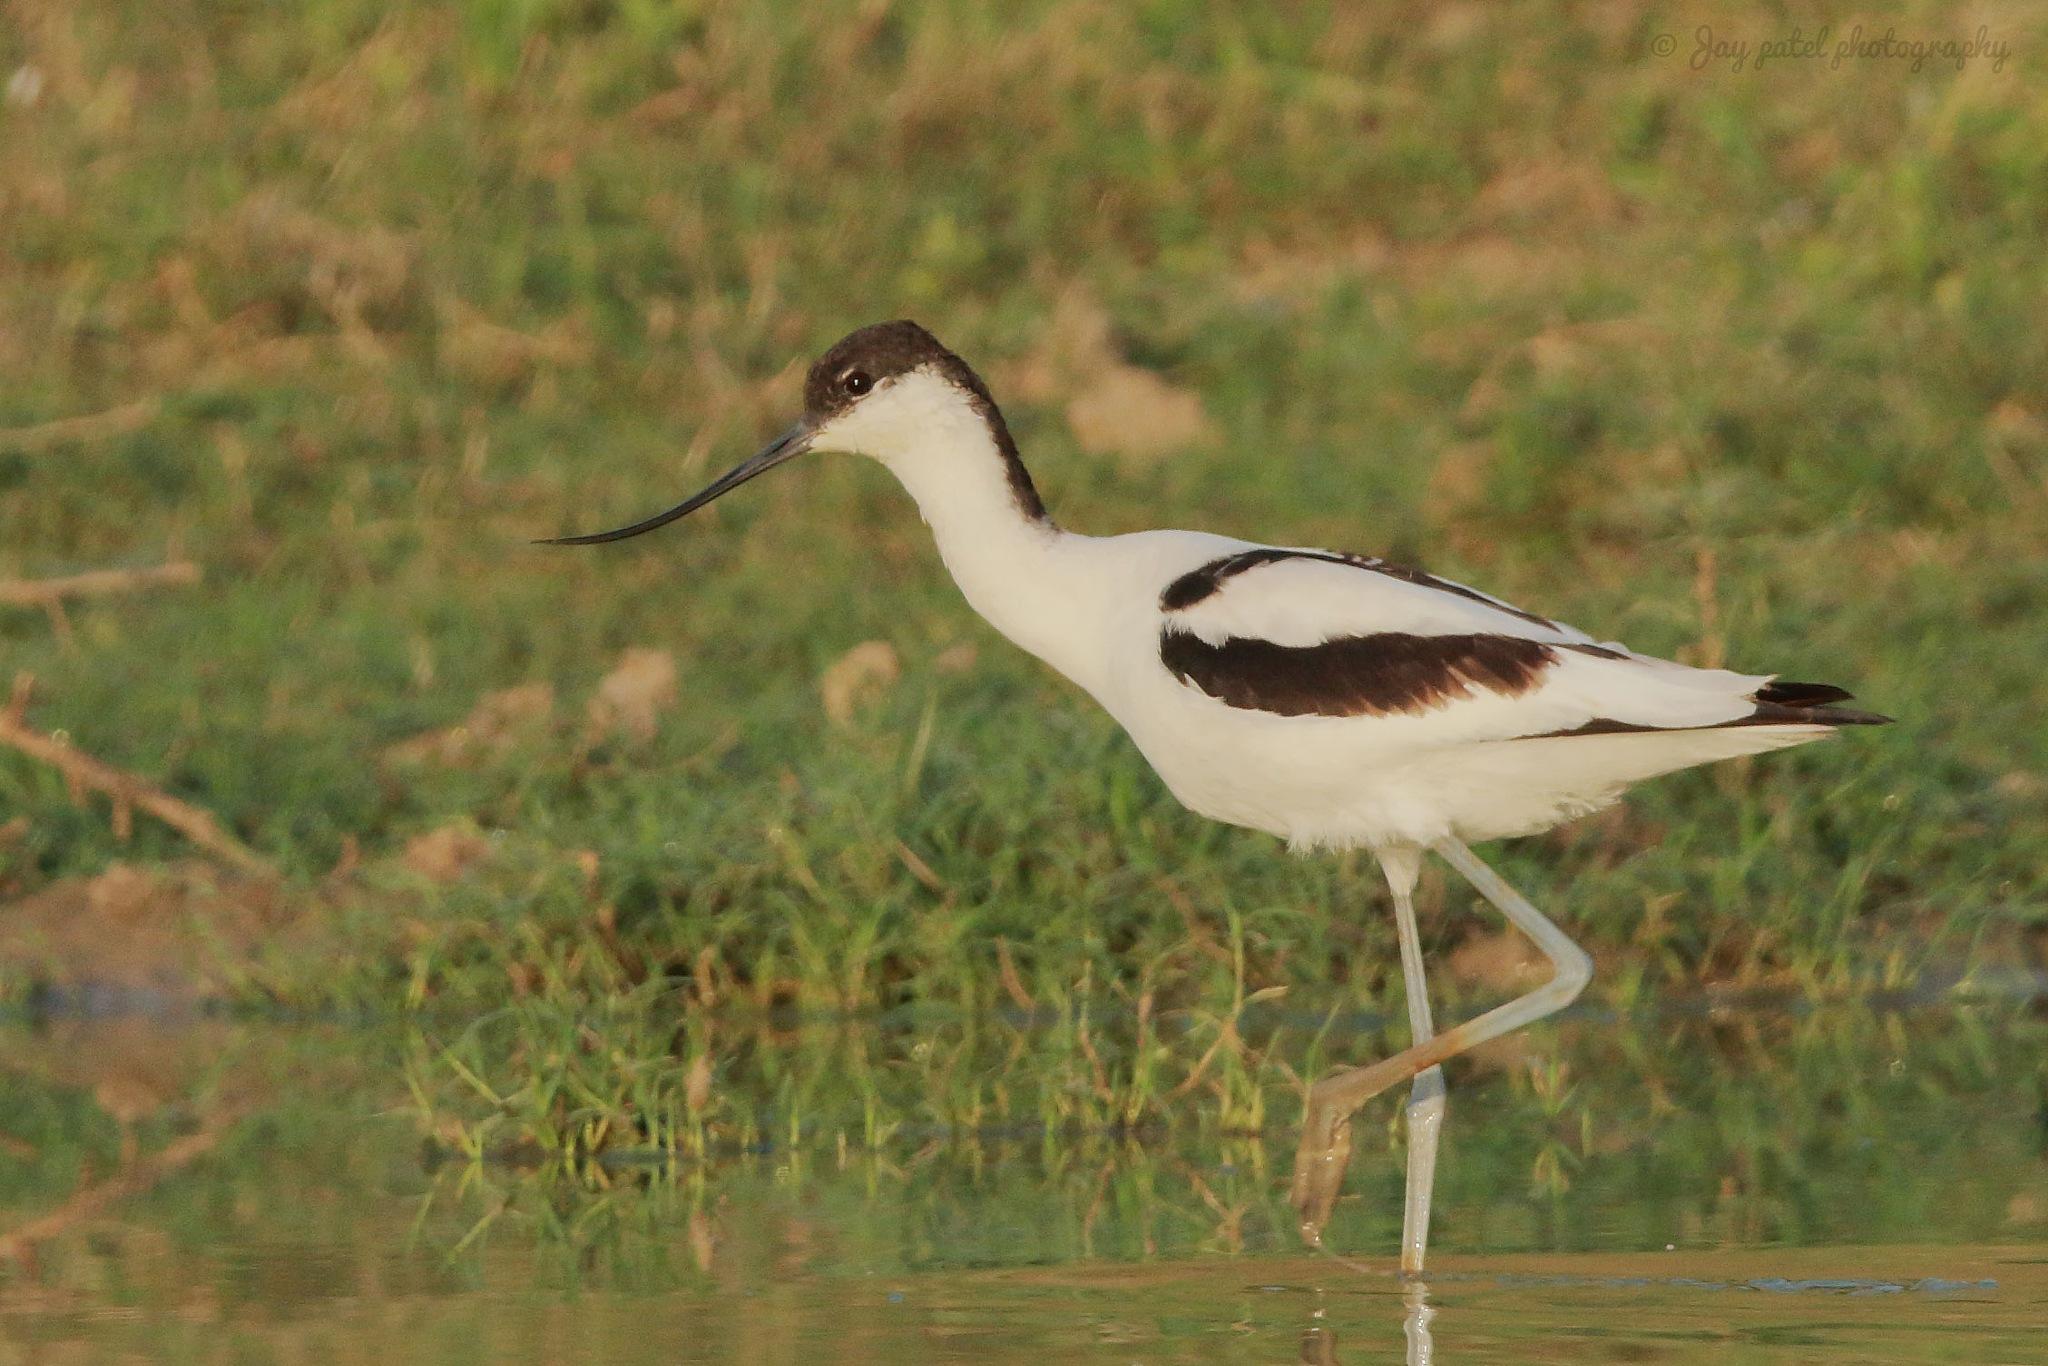 Pied avocet (Recurvirostra avosetta) Gujarati Name : ઉલટી ચાંચ. by Jay Patel